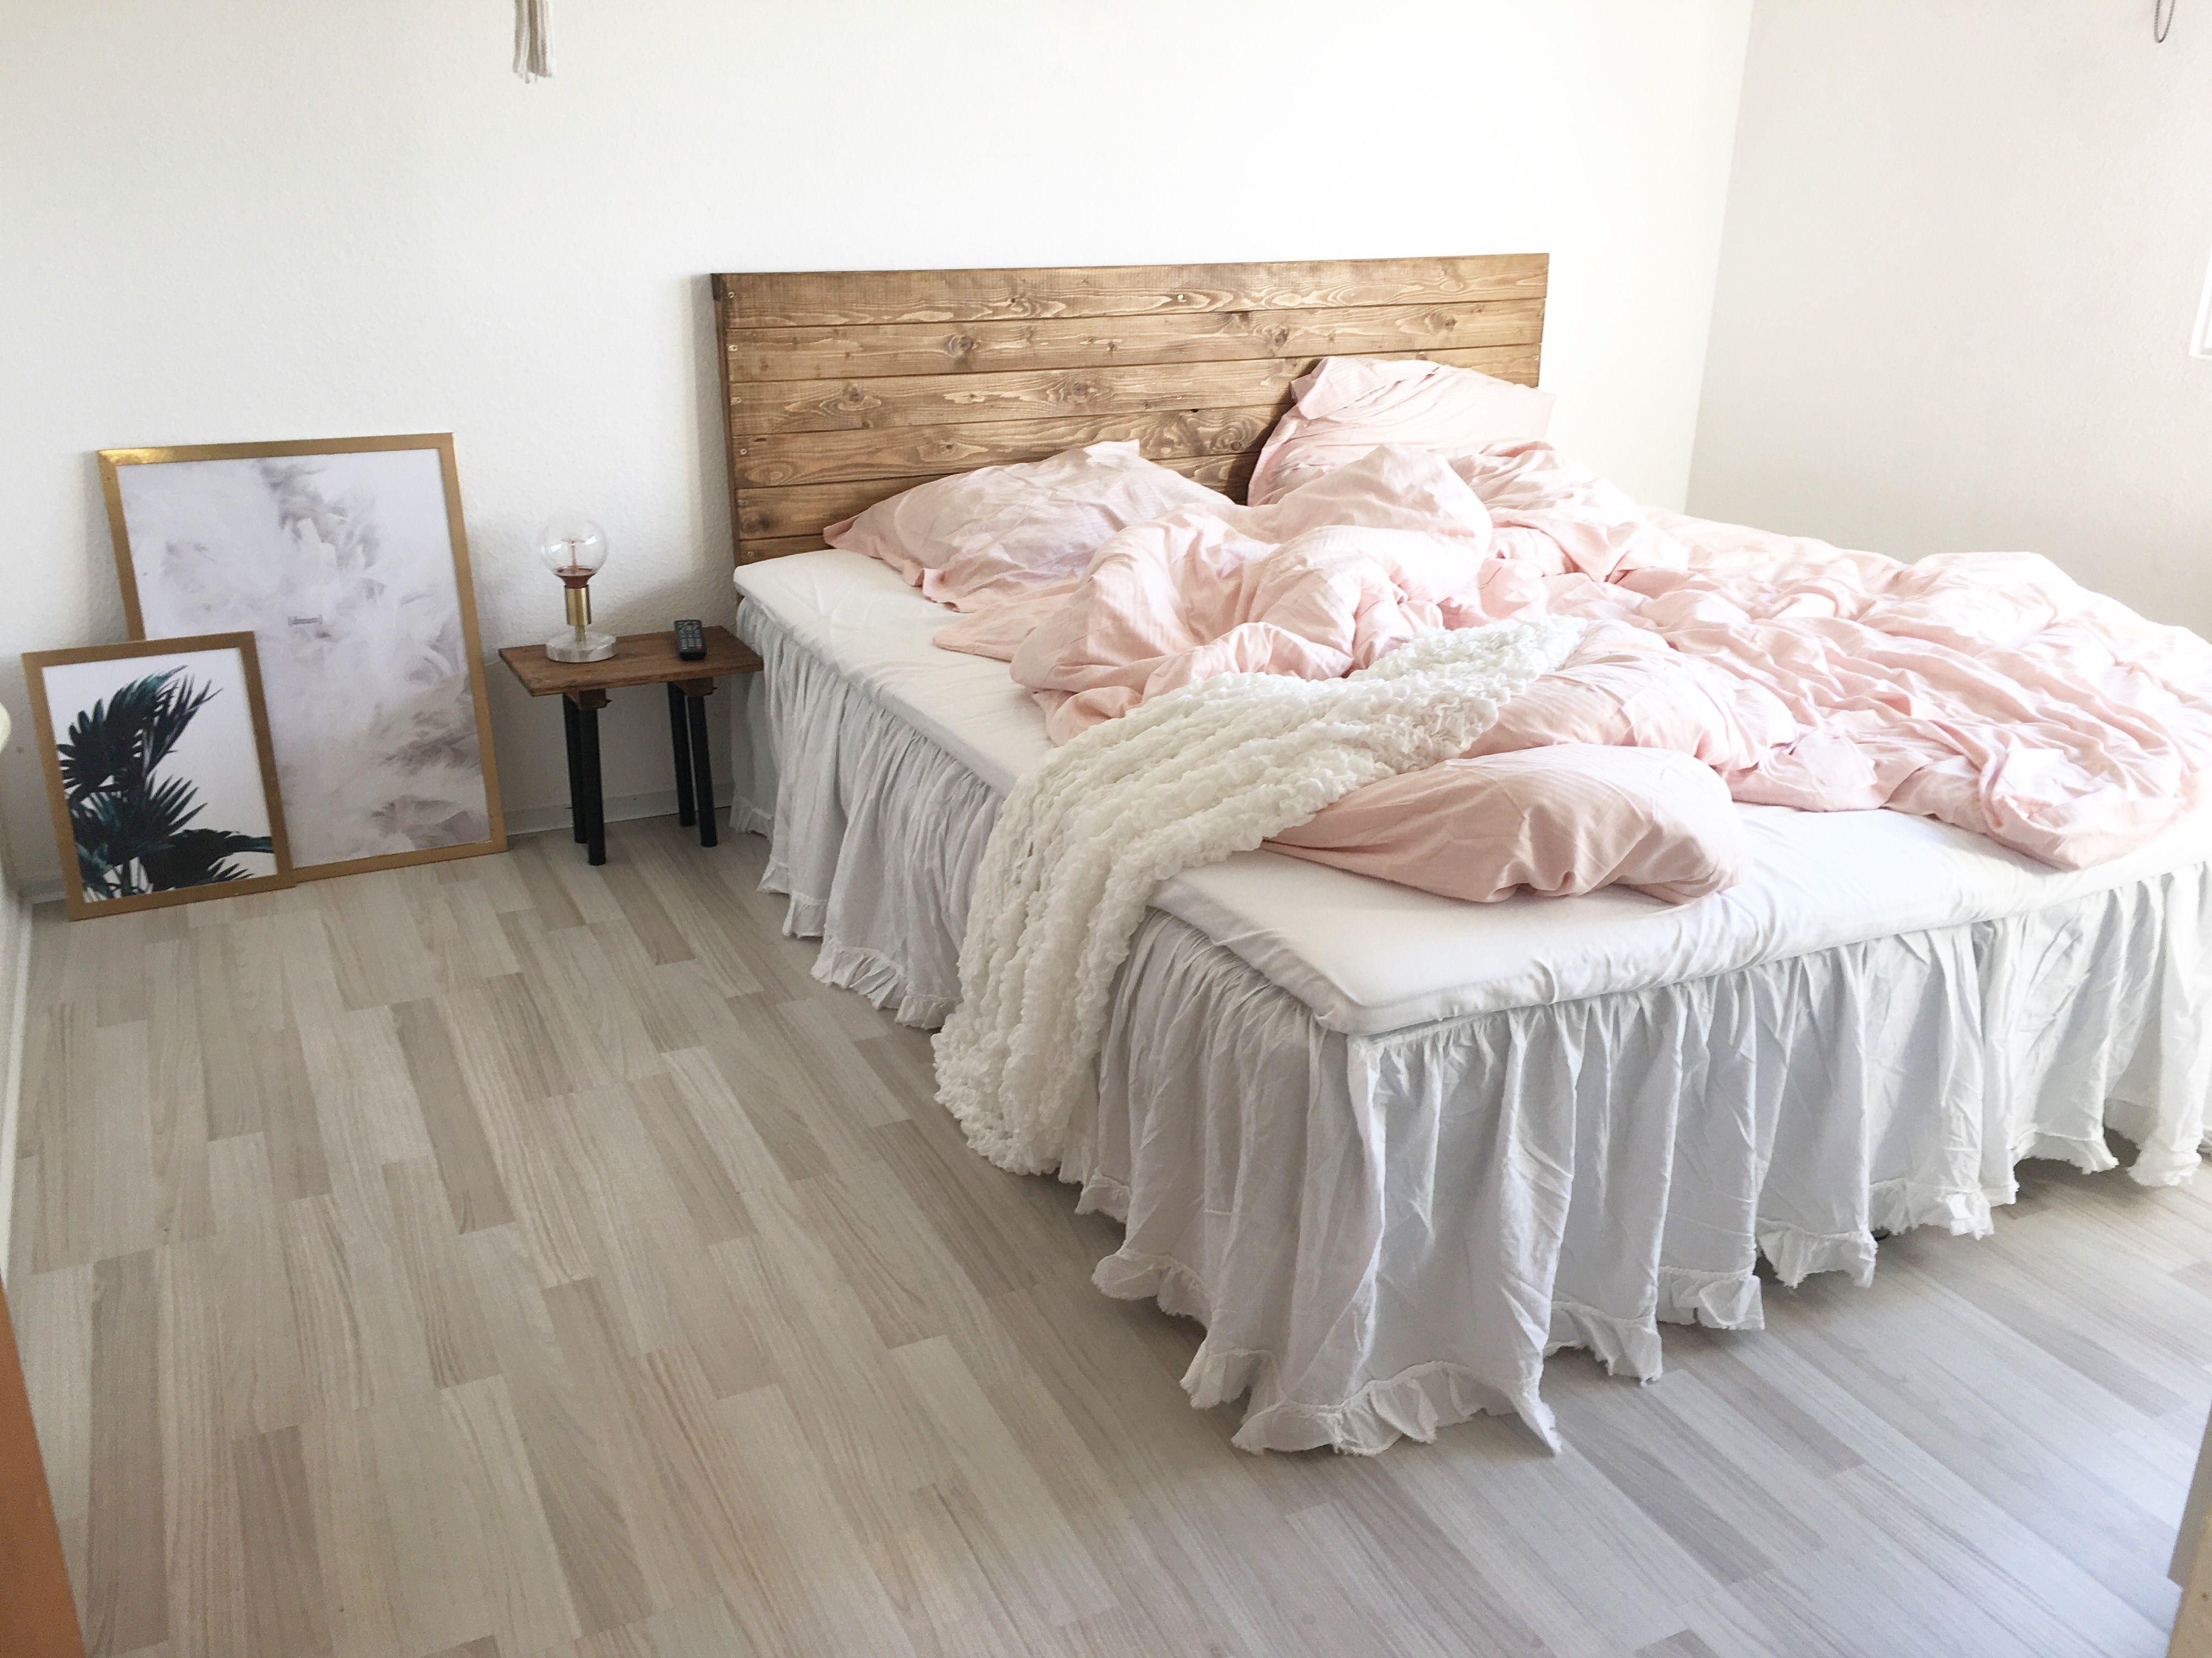 hjemmelavet sengegavl Hjemmelavet sengegavl | Boligindretning i 2018 | Pinterest hjemmelavet sengegavl